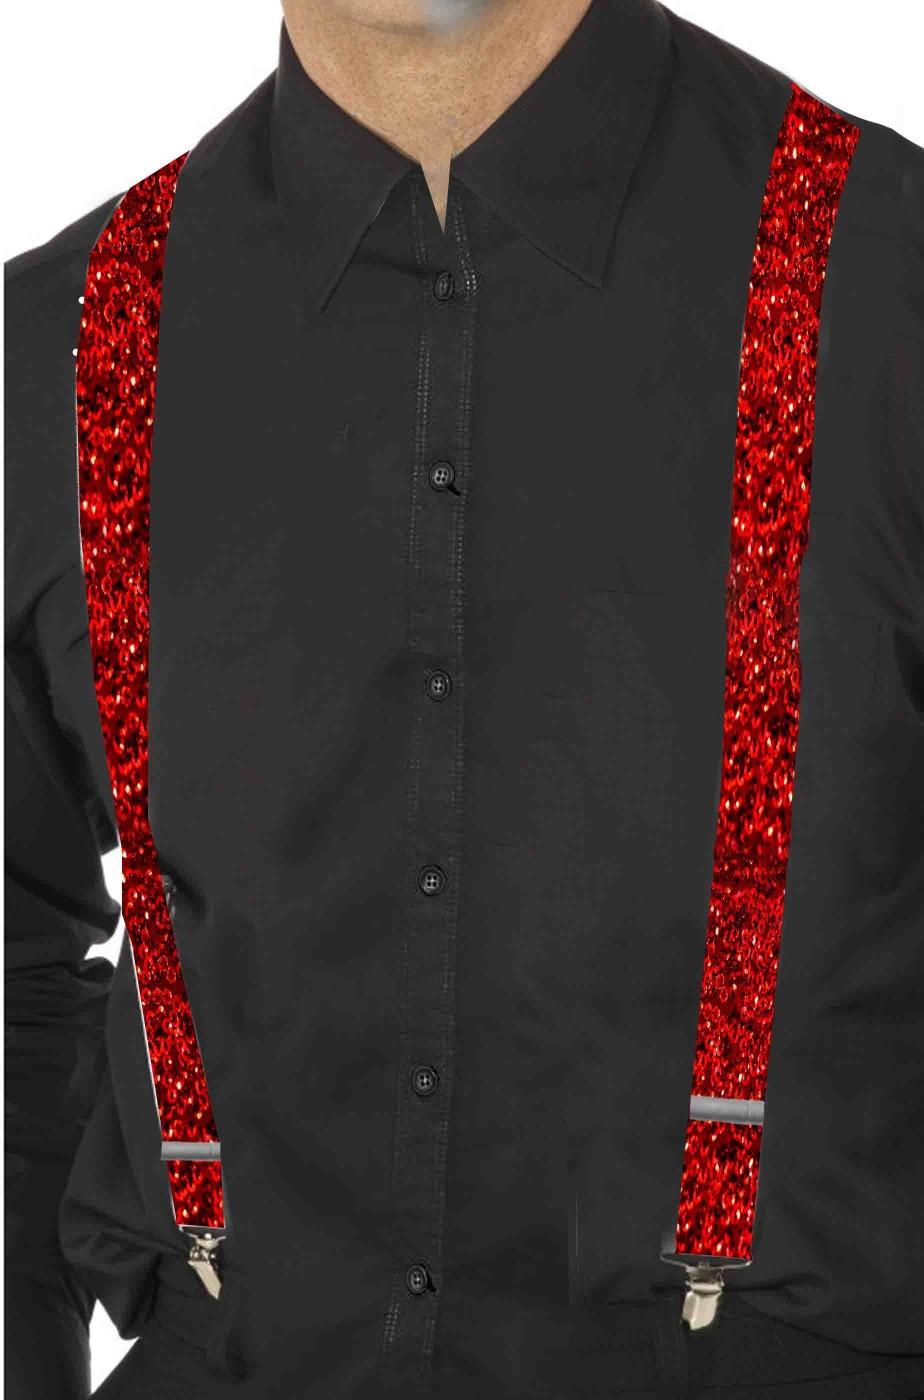 Bretelle rosse di paillettes eleganti